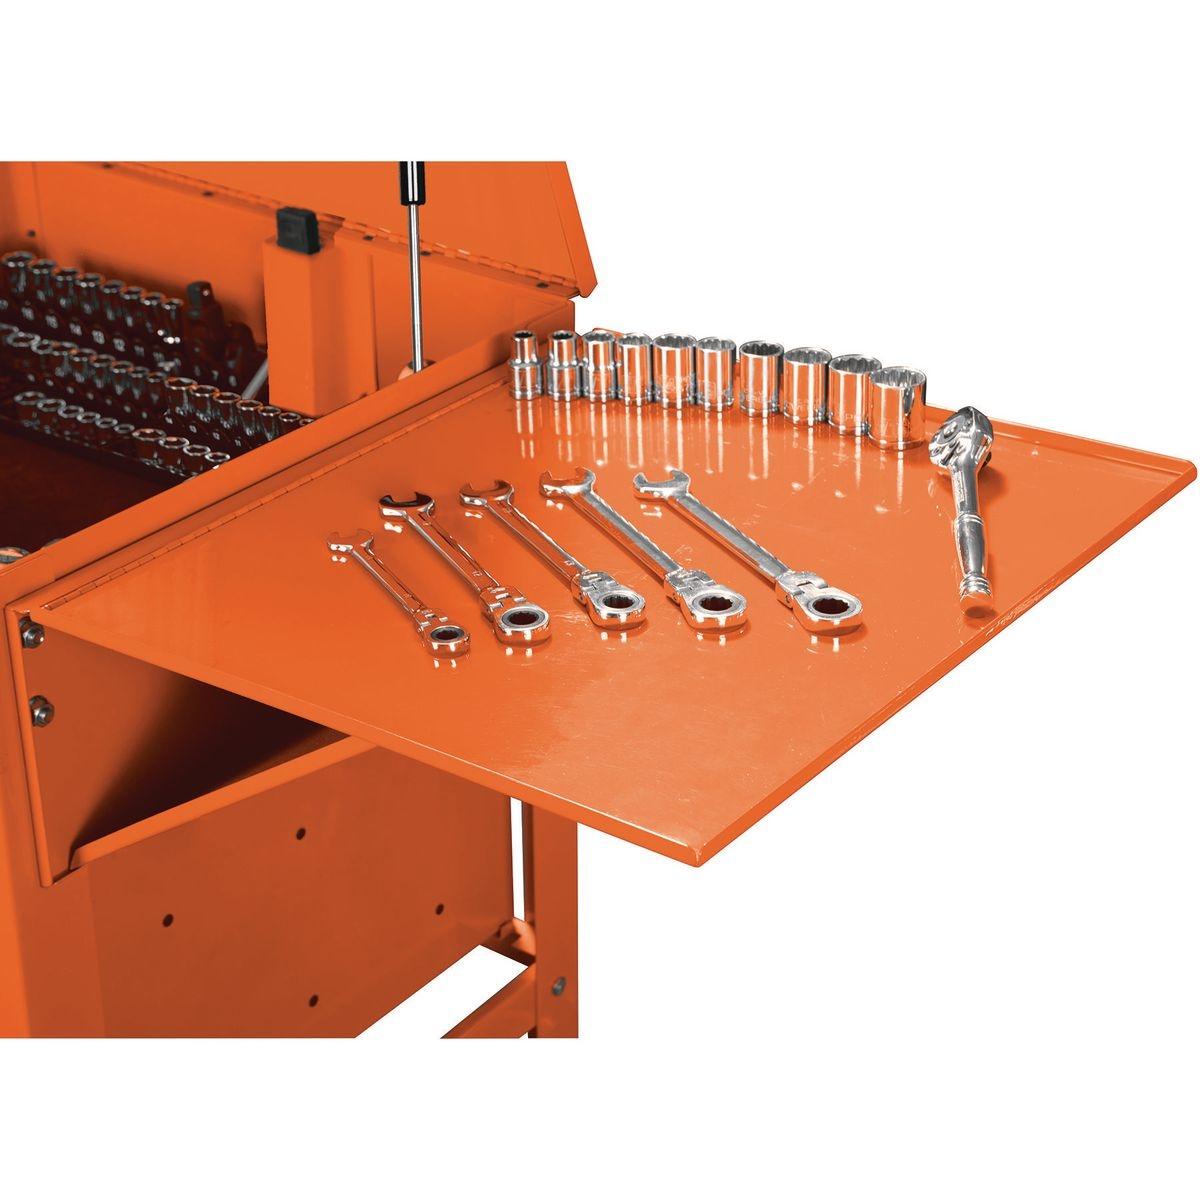 U.S. GENERAL Folding Side Tray for Orange Tool Cart - Item 64726